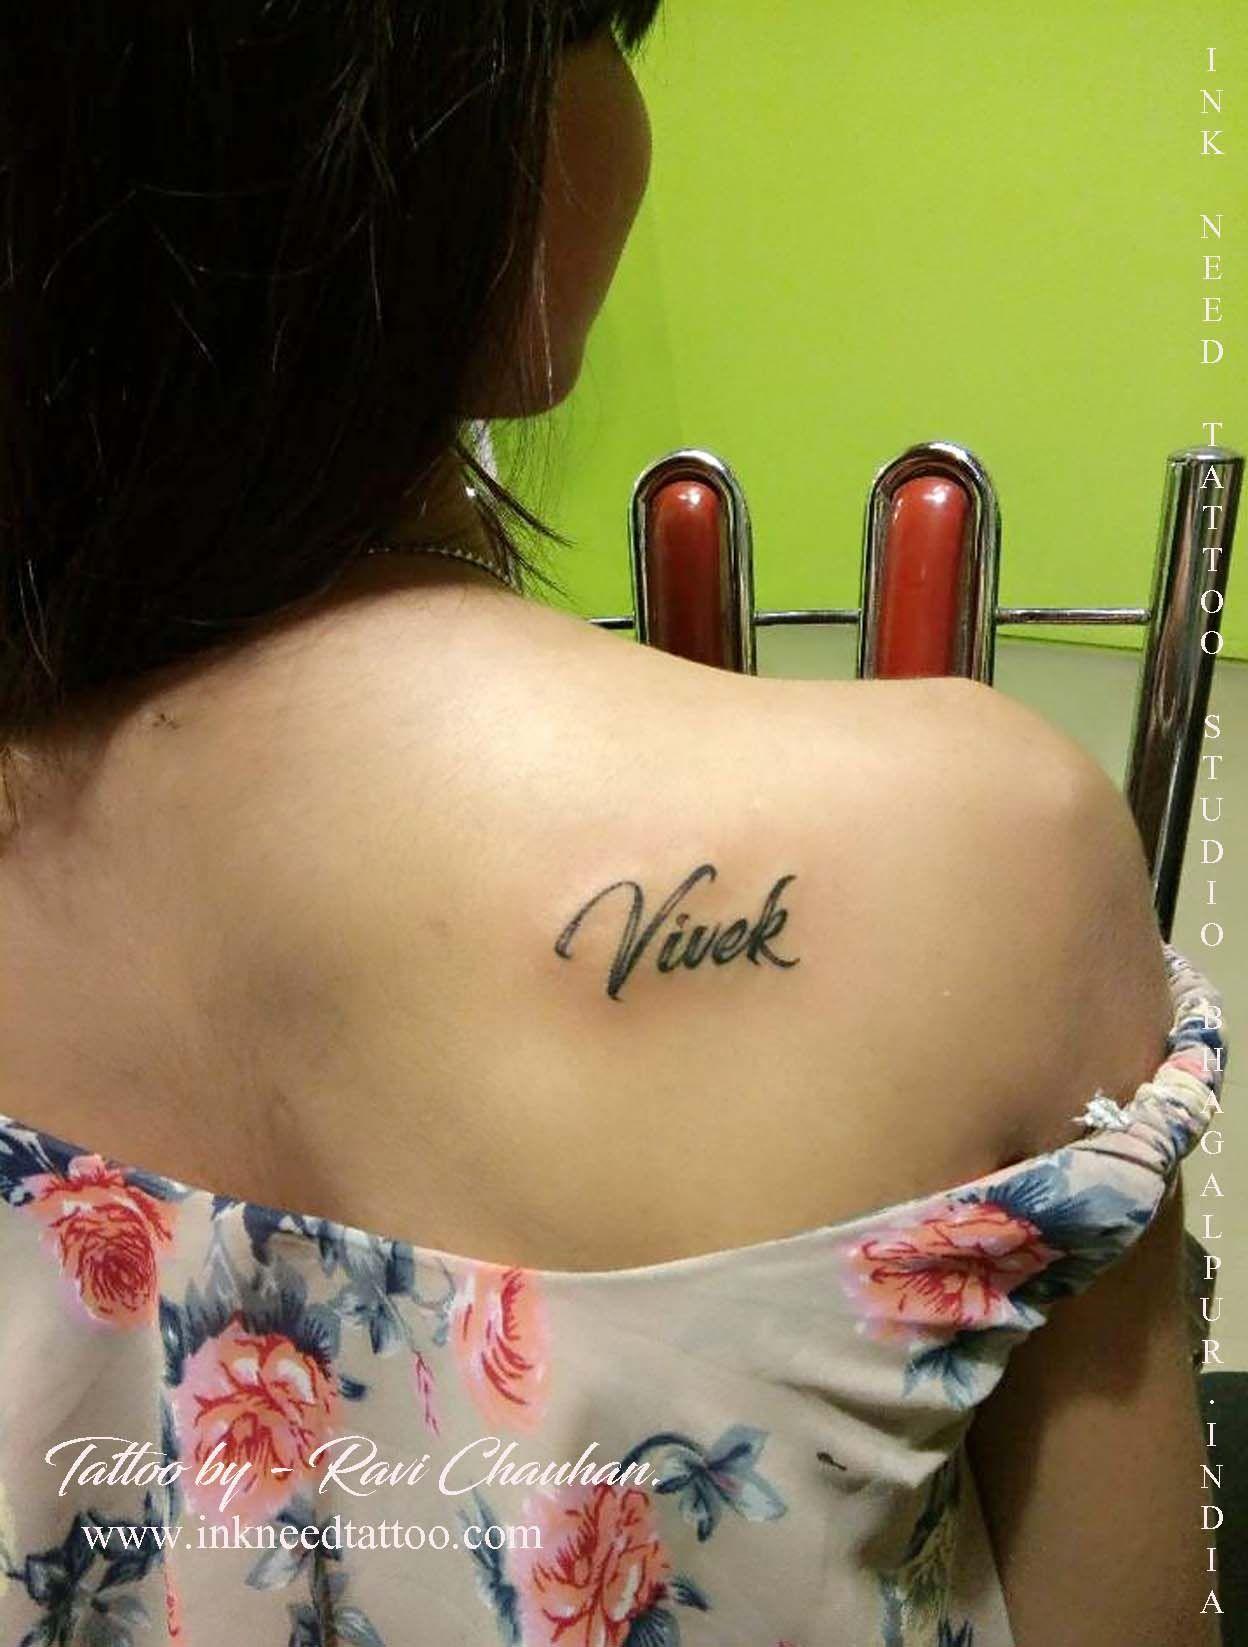 Alphabet Tattoo Name Tattoo Ink Need Tattoo Ravi Chauhan Homemade Tattoo Ink Tattoo Ink Colors Gold Tattoo Ink